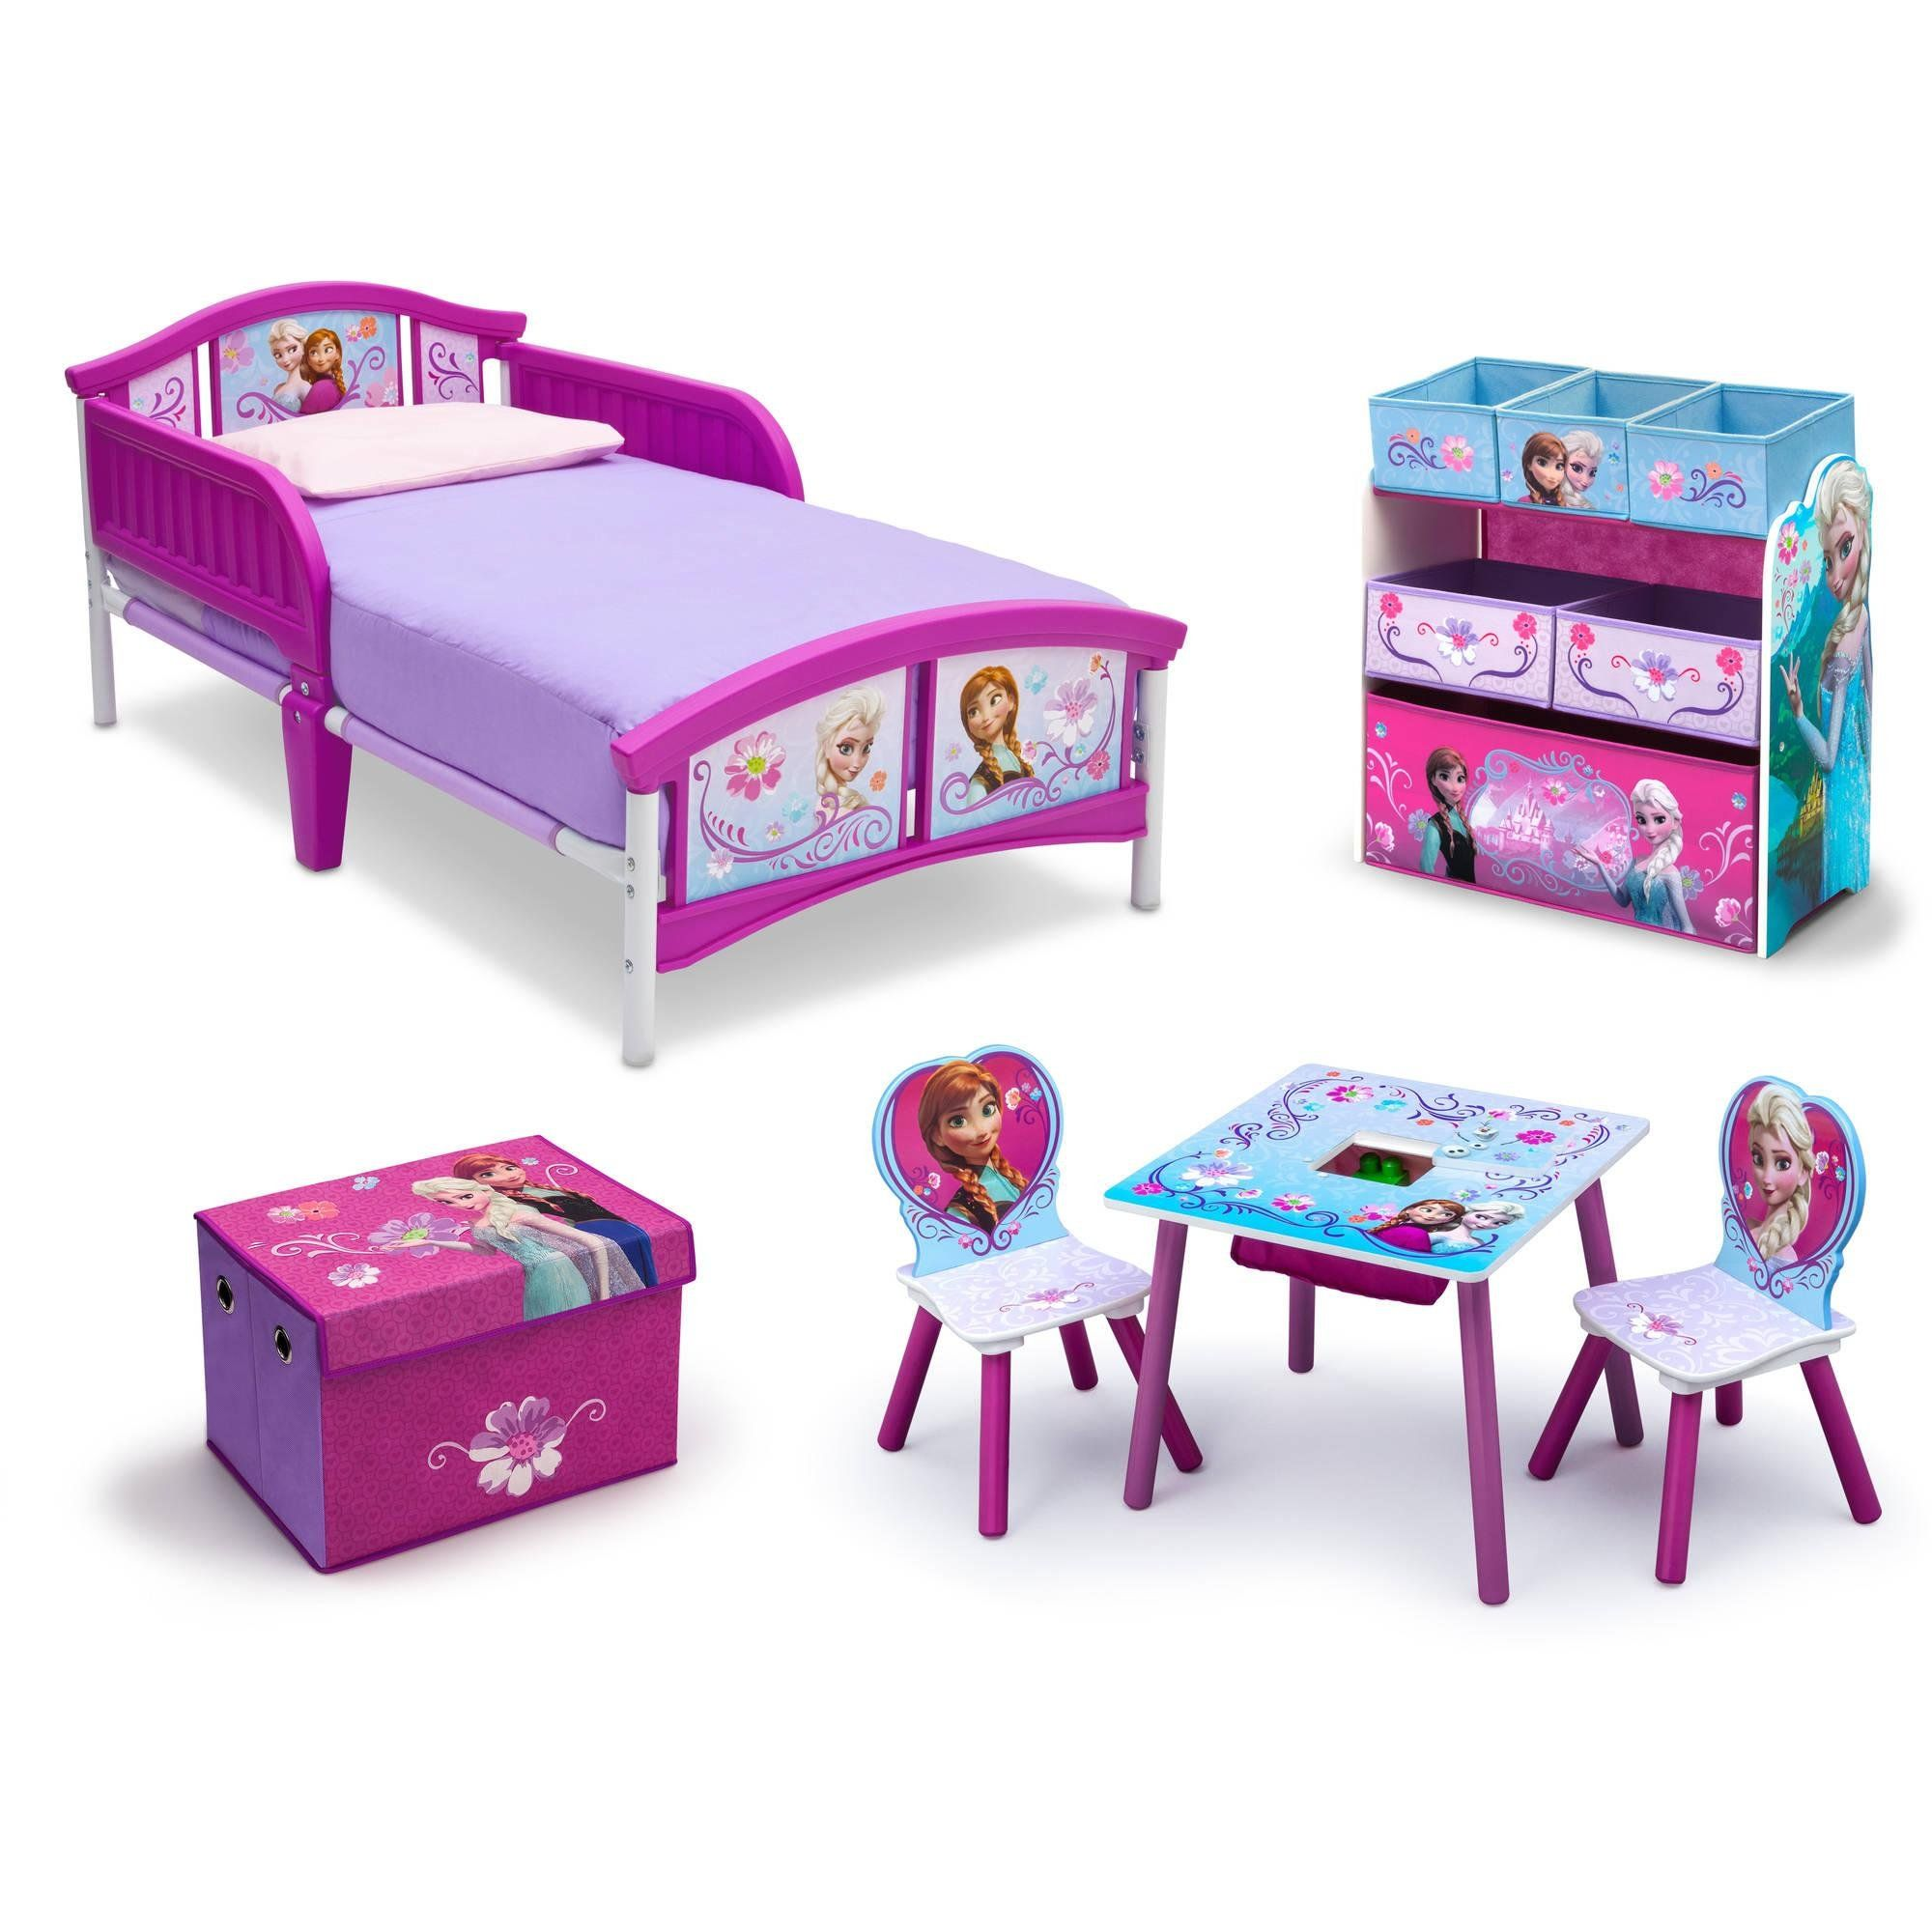 Frozen Bedroom Decor Toddler Kids Bed Disney Frozen Movie Princess Toy  Chair Set Girls Toy Chest. Frozen Bedroom DecorRoom In A BoxFrozen ...